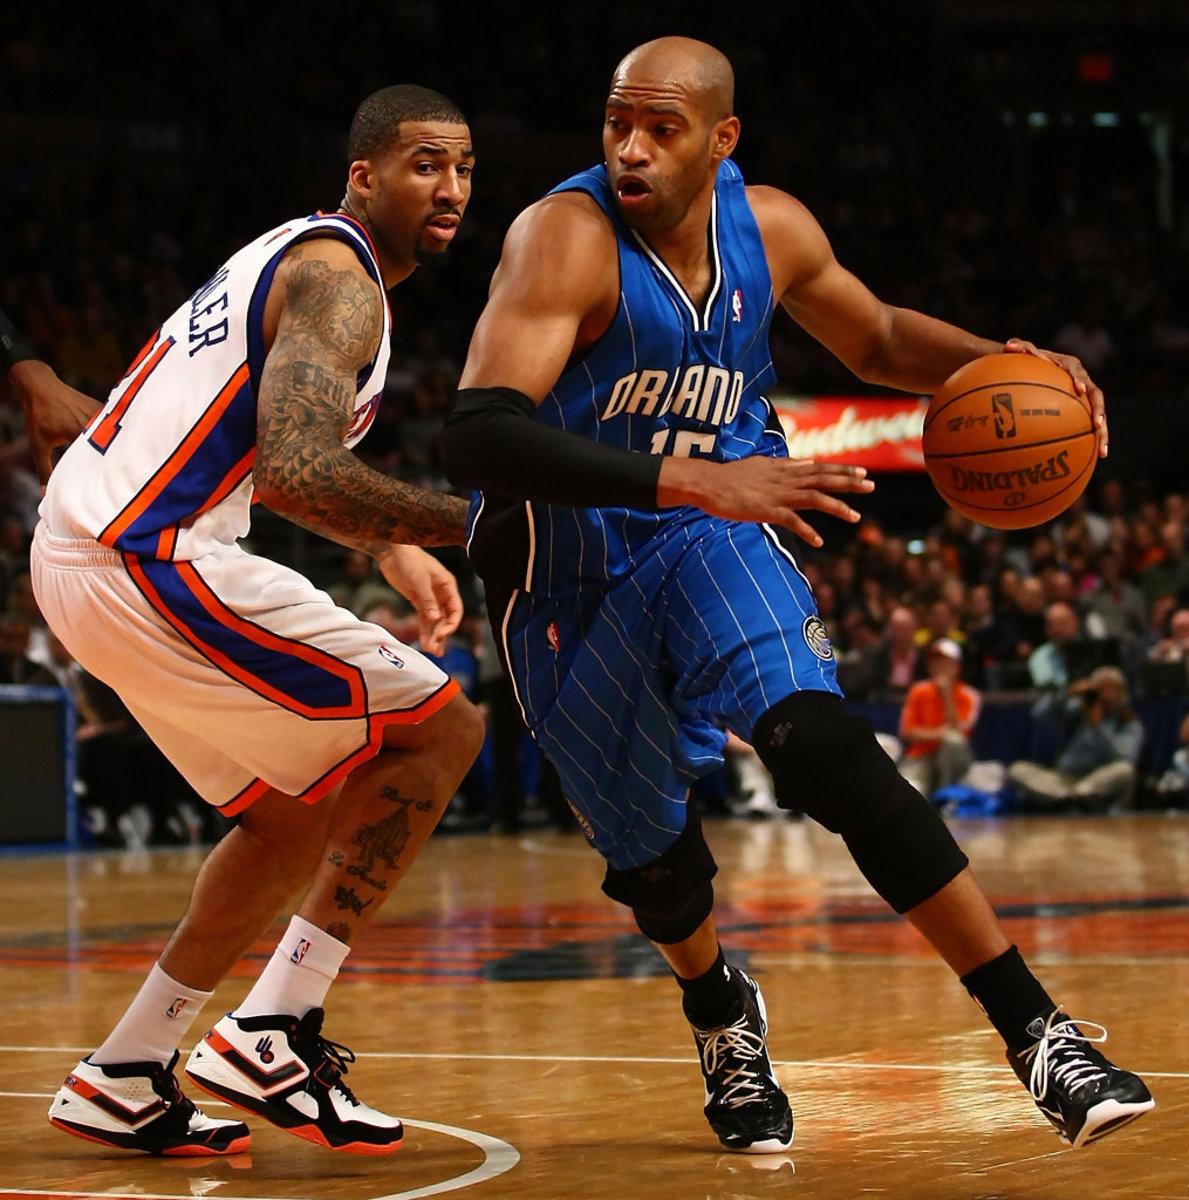 Orlando+Magic+v+New+York+Knicks+6Kn23XRFD22x